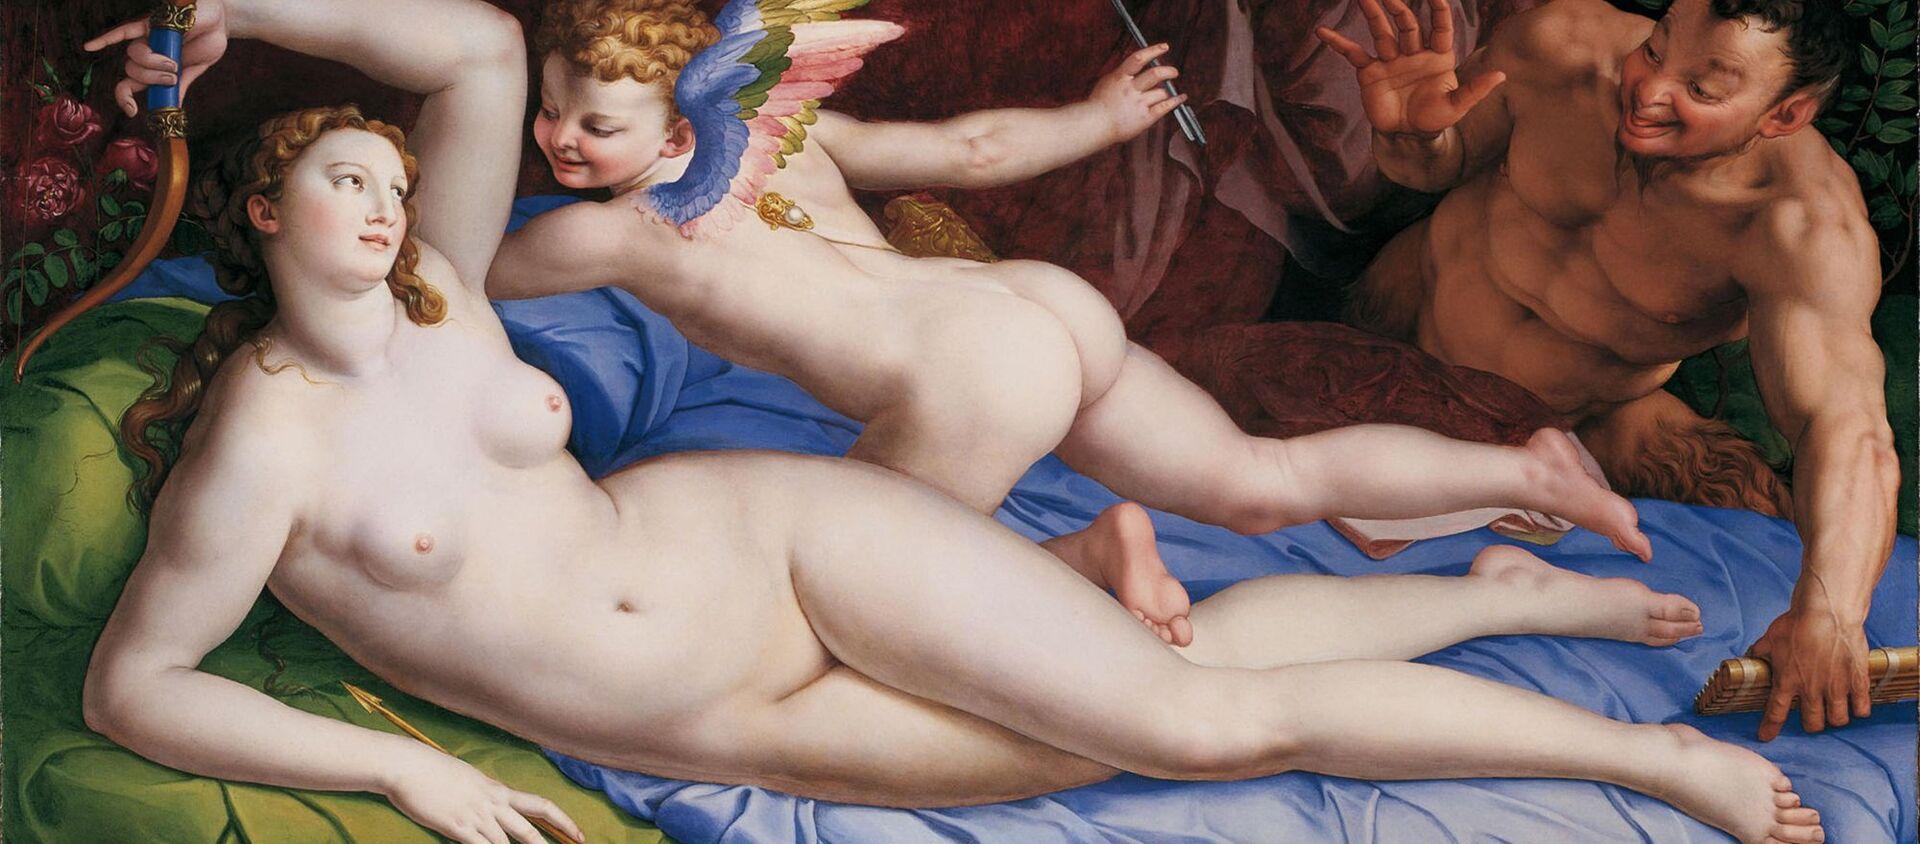 Venere, Cupido e il Satiro - Agnolo Bronzino, XVI sec. - Sputnik Italia, 1920, 07.10.2020